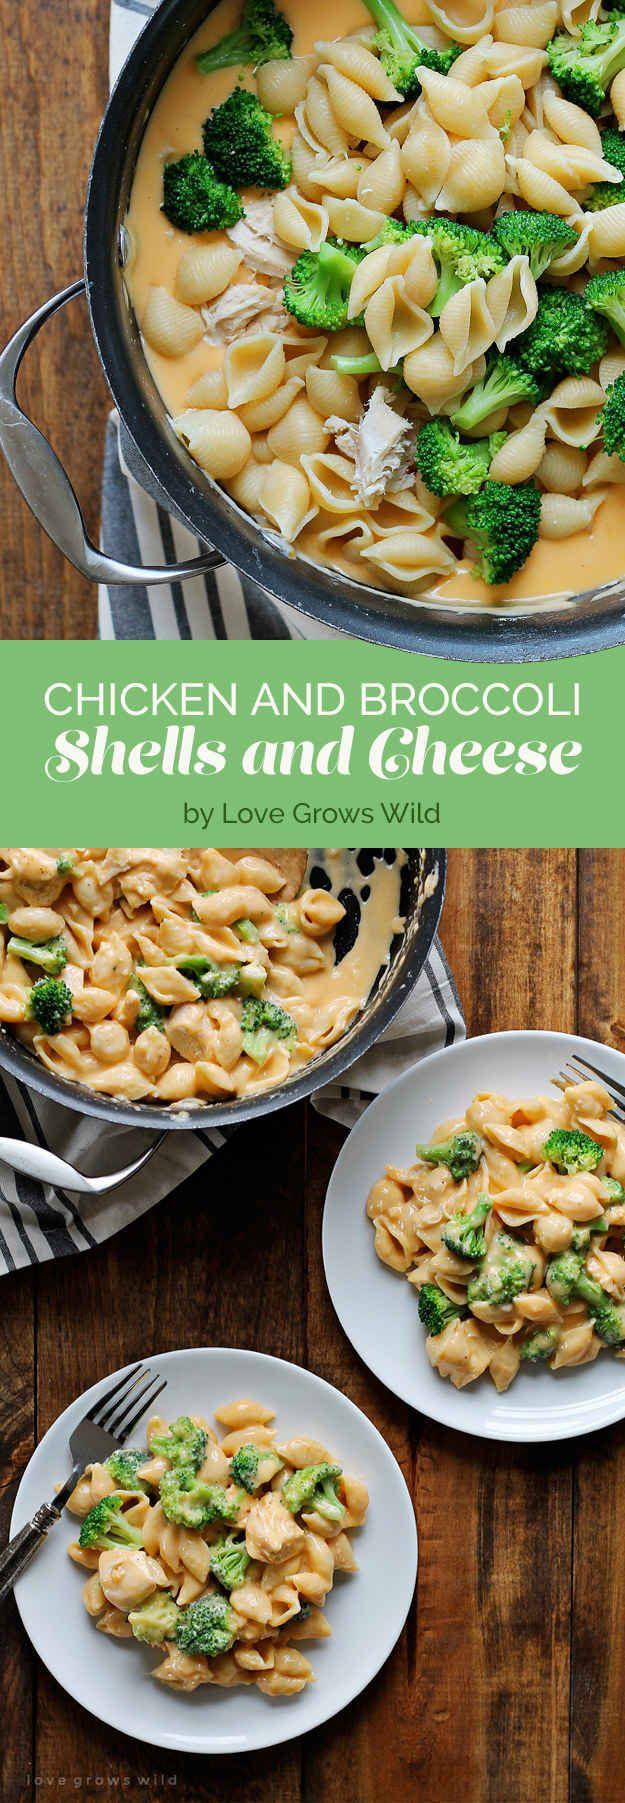 Chicken and Broccoli Shells and Cheese. #fallrecipesdinner